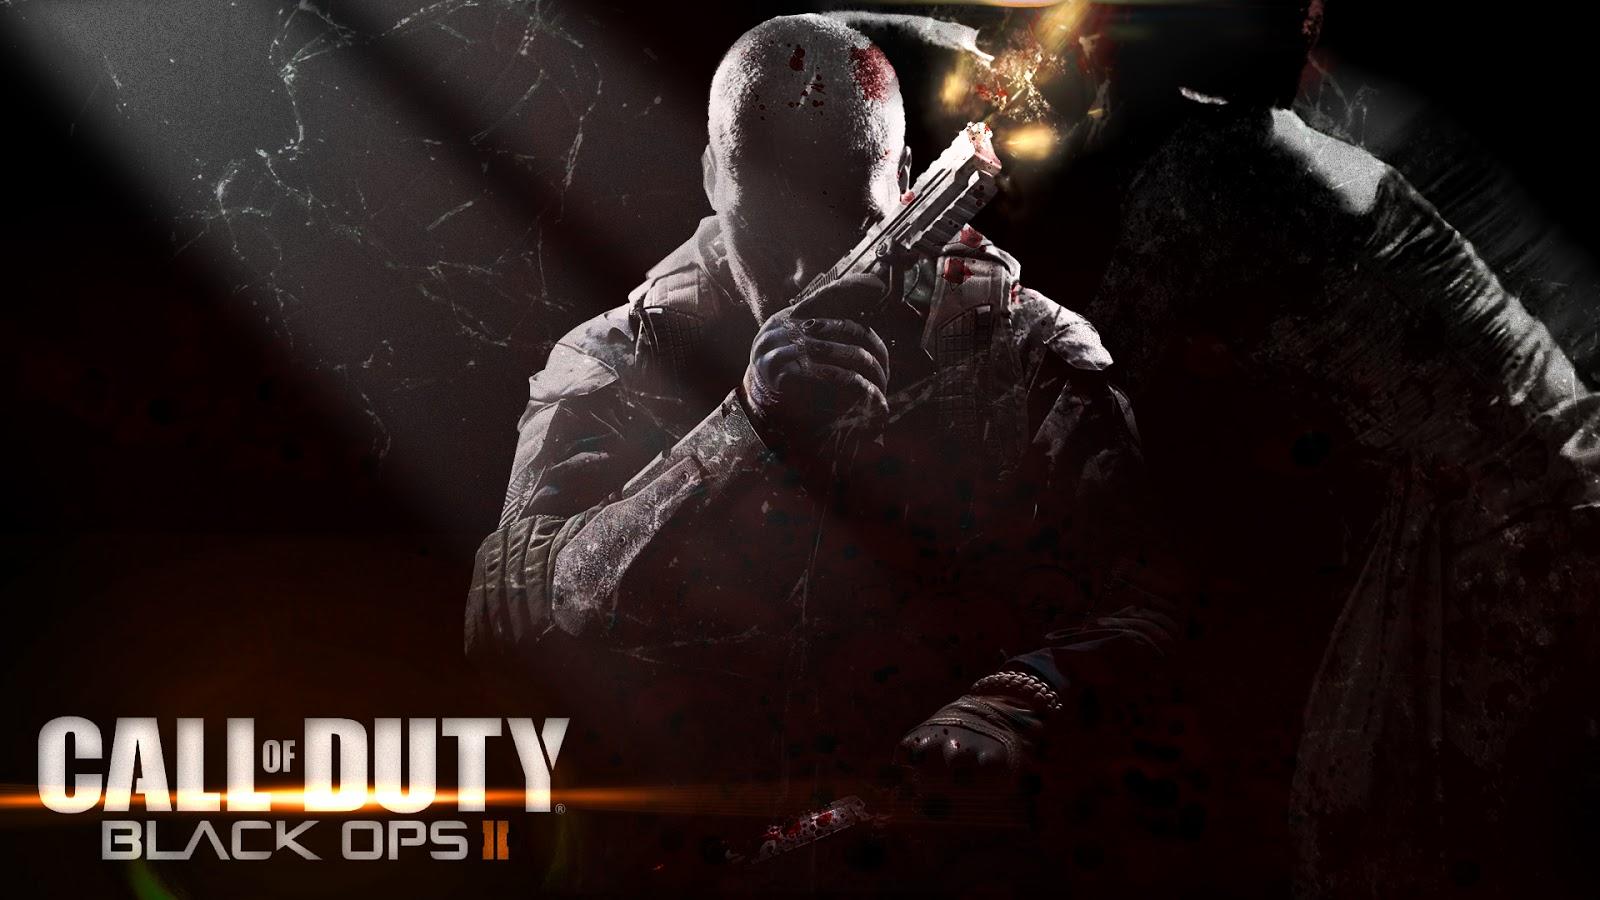 http://3.bp.blogspot.com/-p_RkJbbUnGQ/UKT1W55RMzI/AAAAAAAAAes/l4363rT579A/s1600/20121114_COD_II_Zombies.jpg